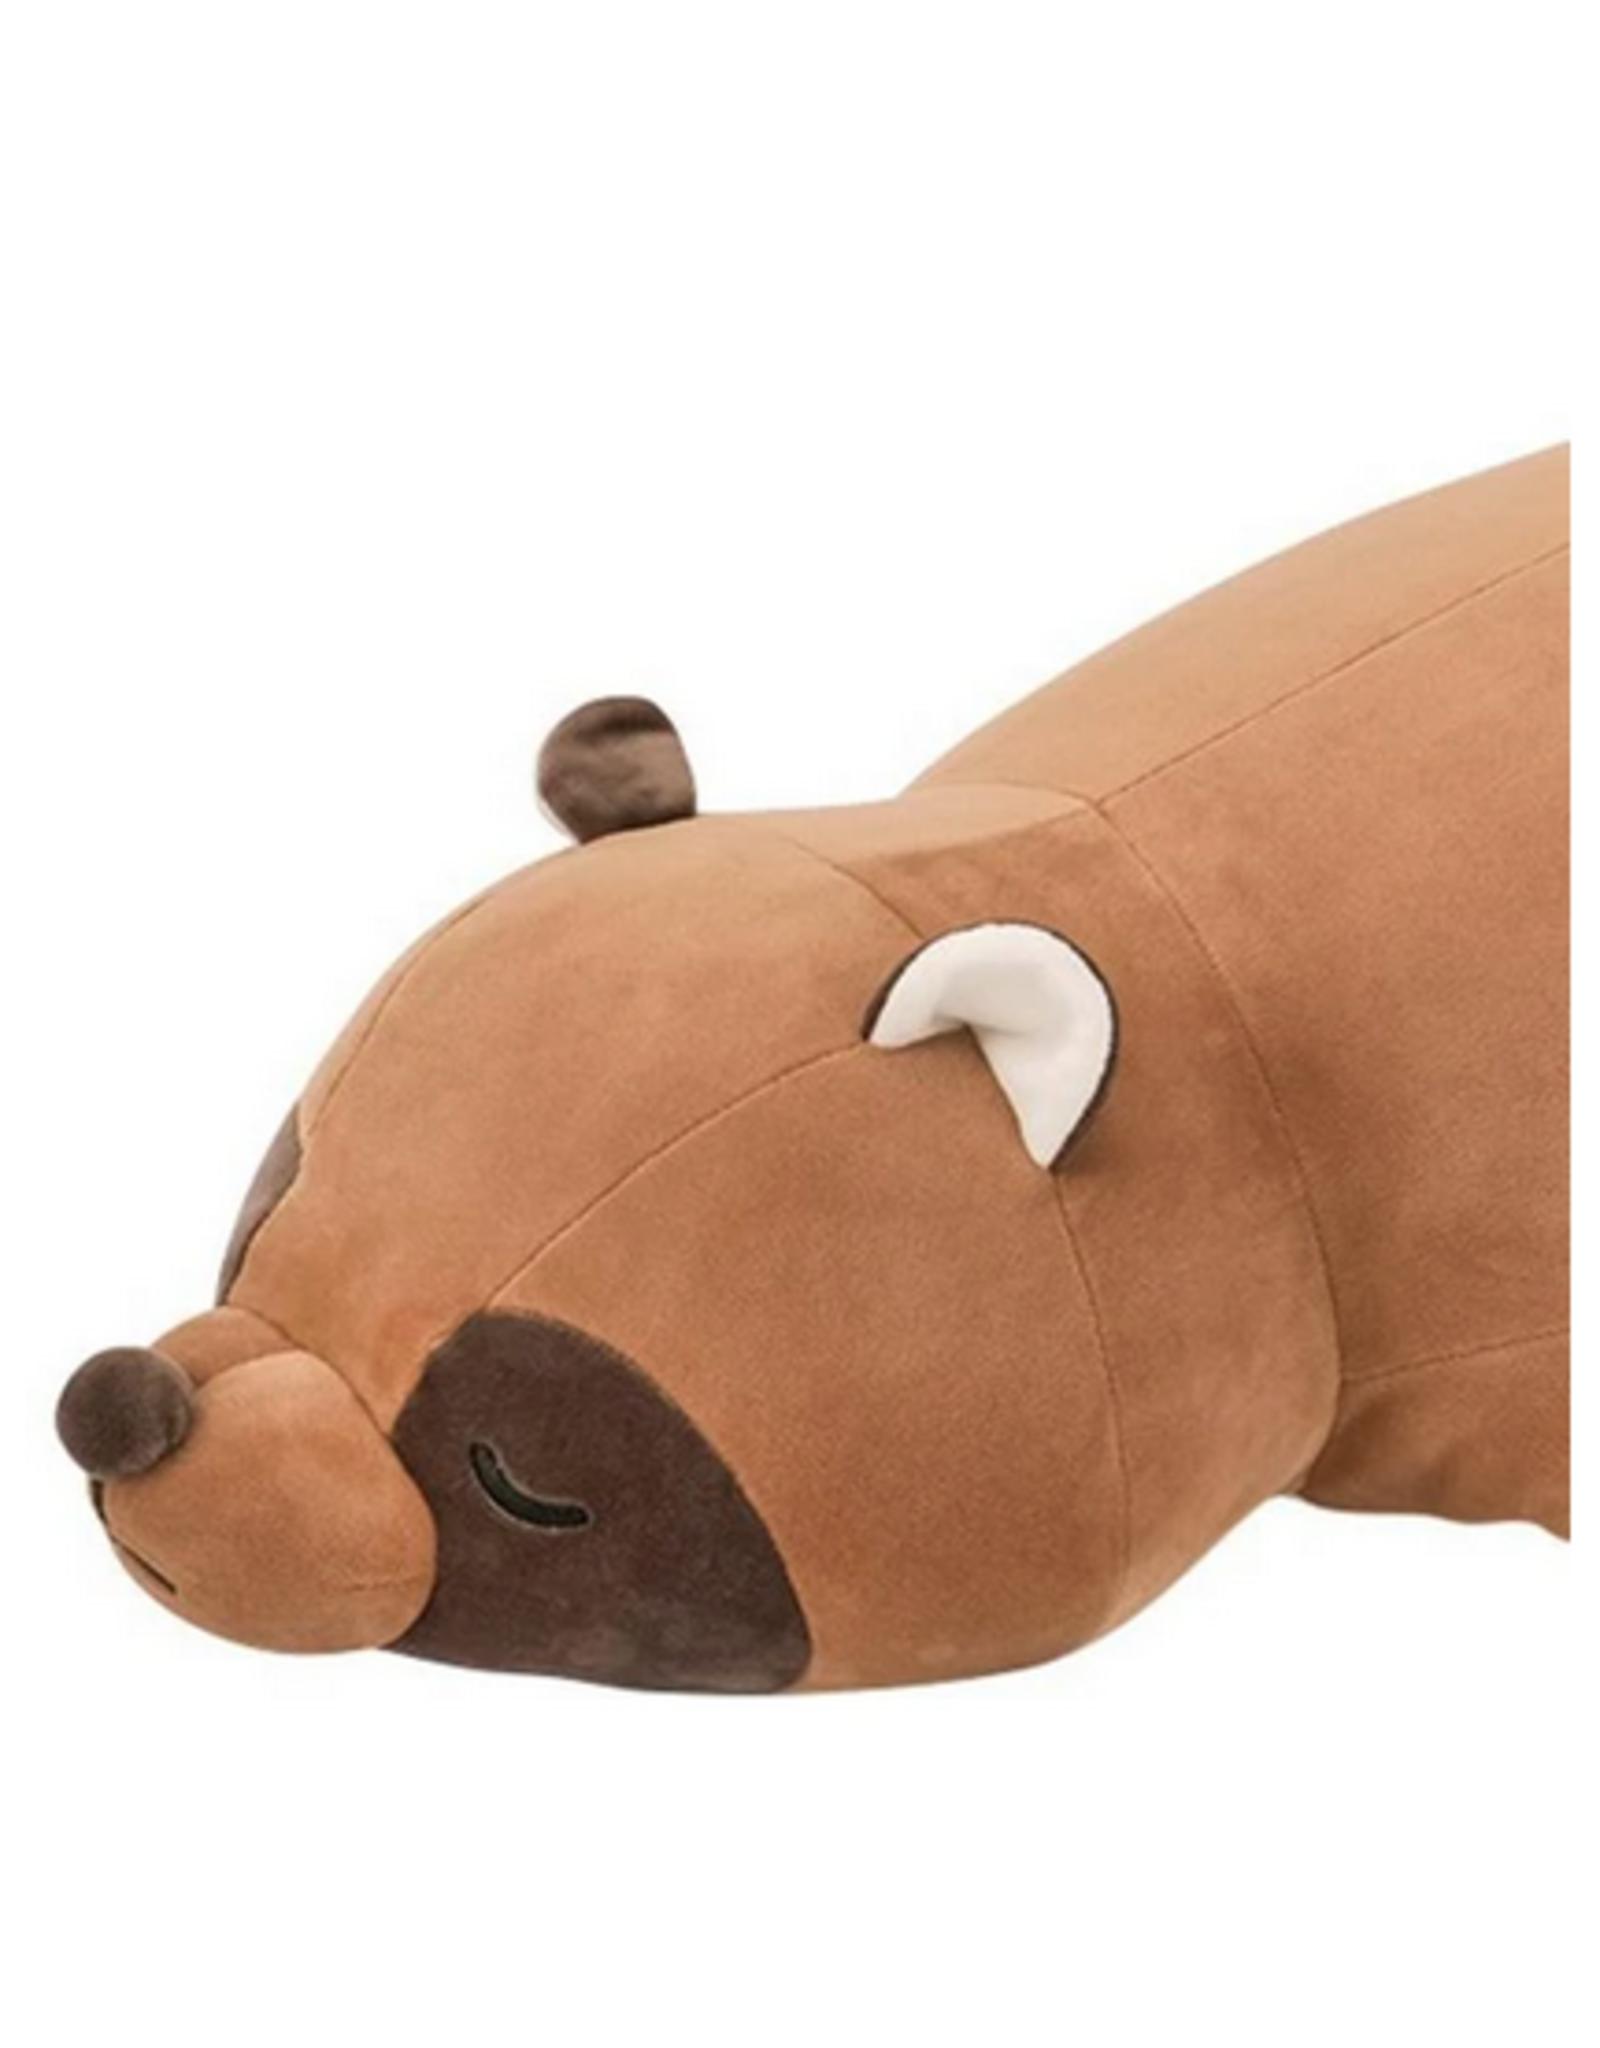 Nemu Raccoon Body Pillow